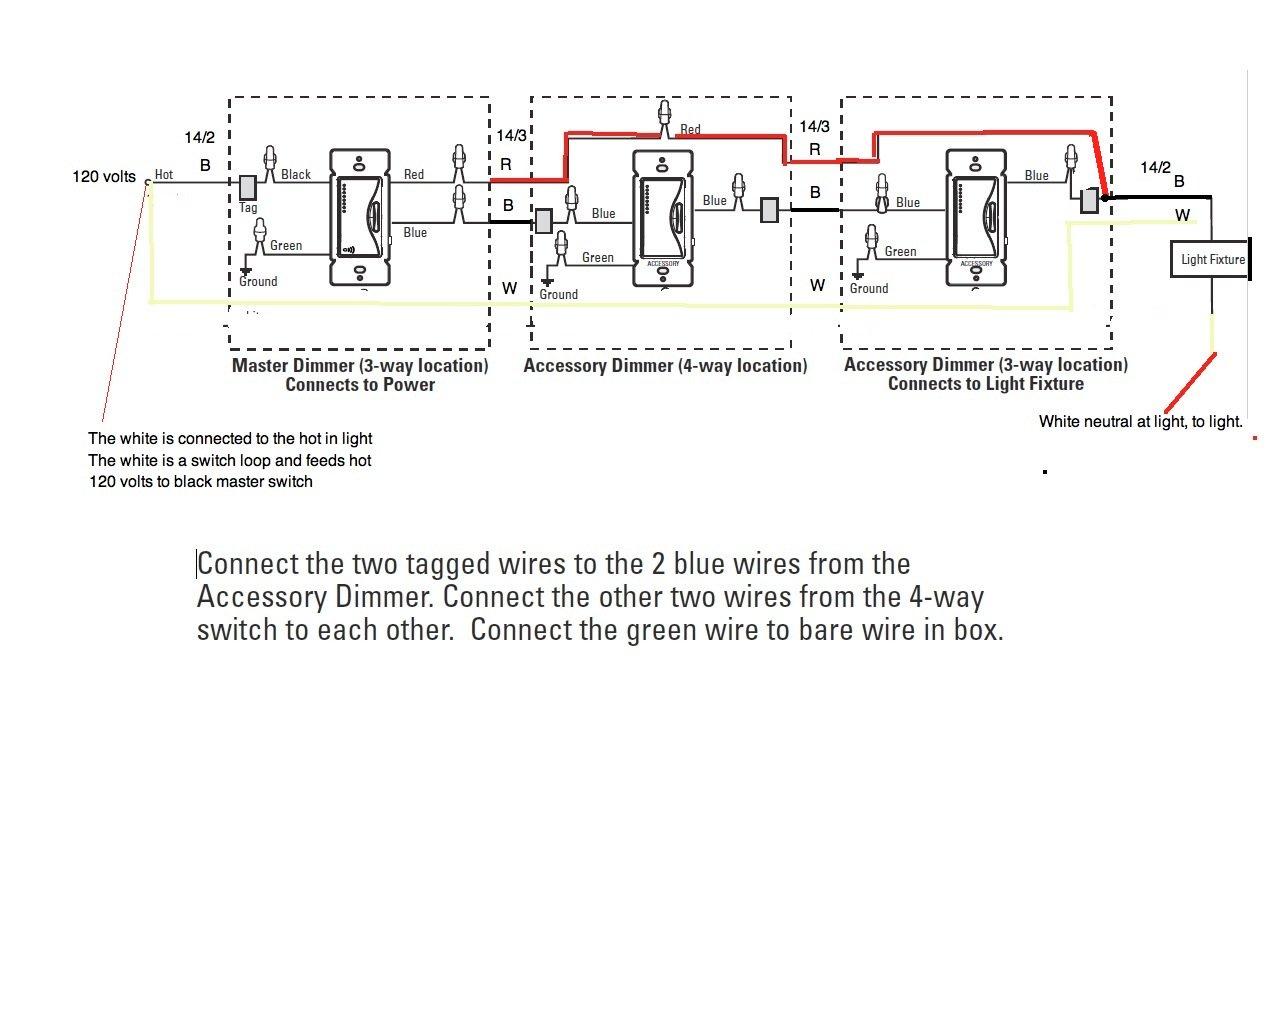 Pleasant Four Way Dimmer Switch Wiring Diagram Wiring Library Wiring Cloud Domeilariaidewilluminateatxorg